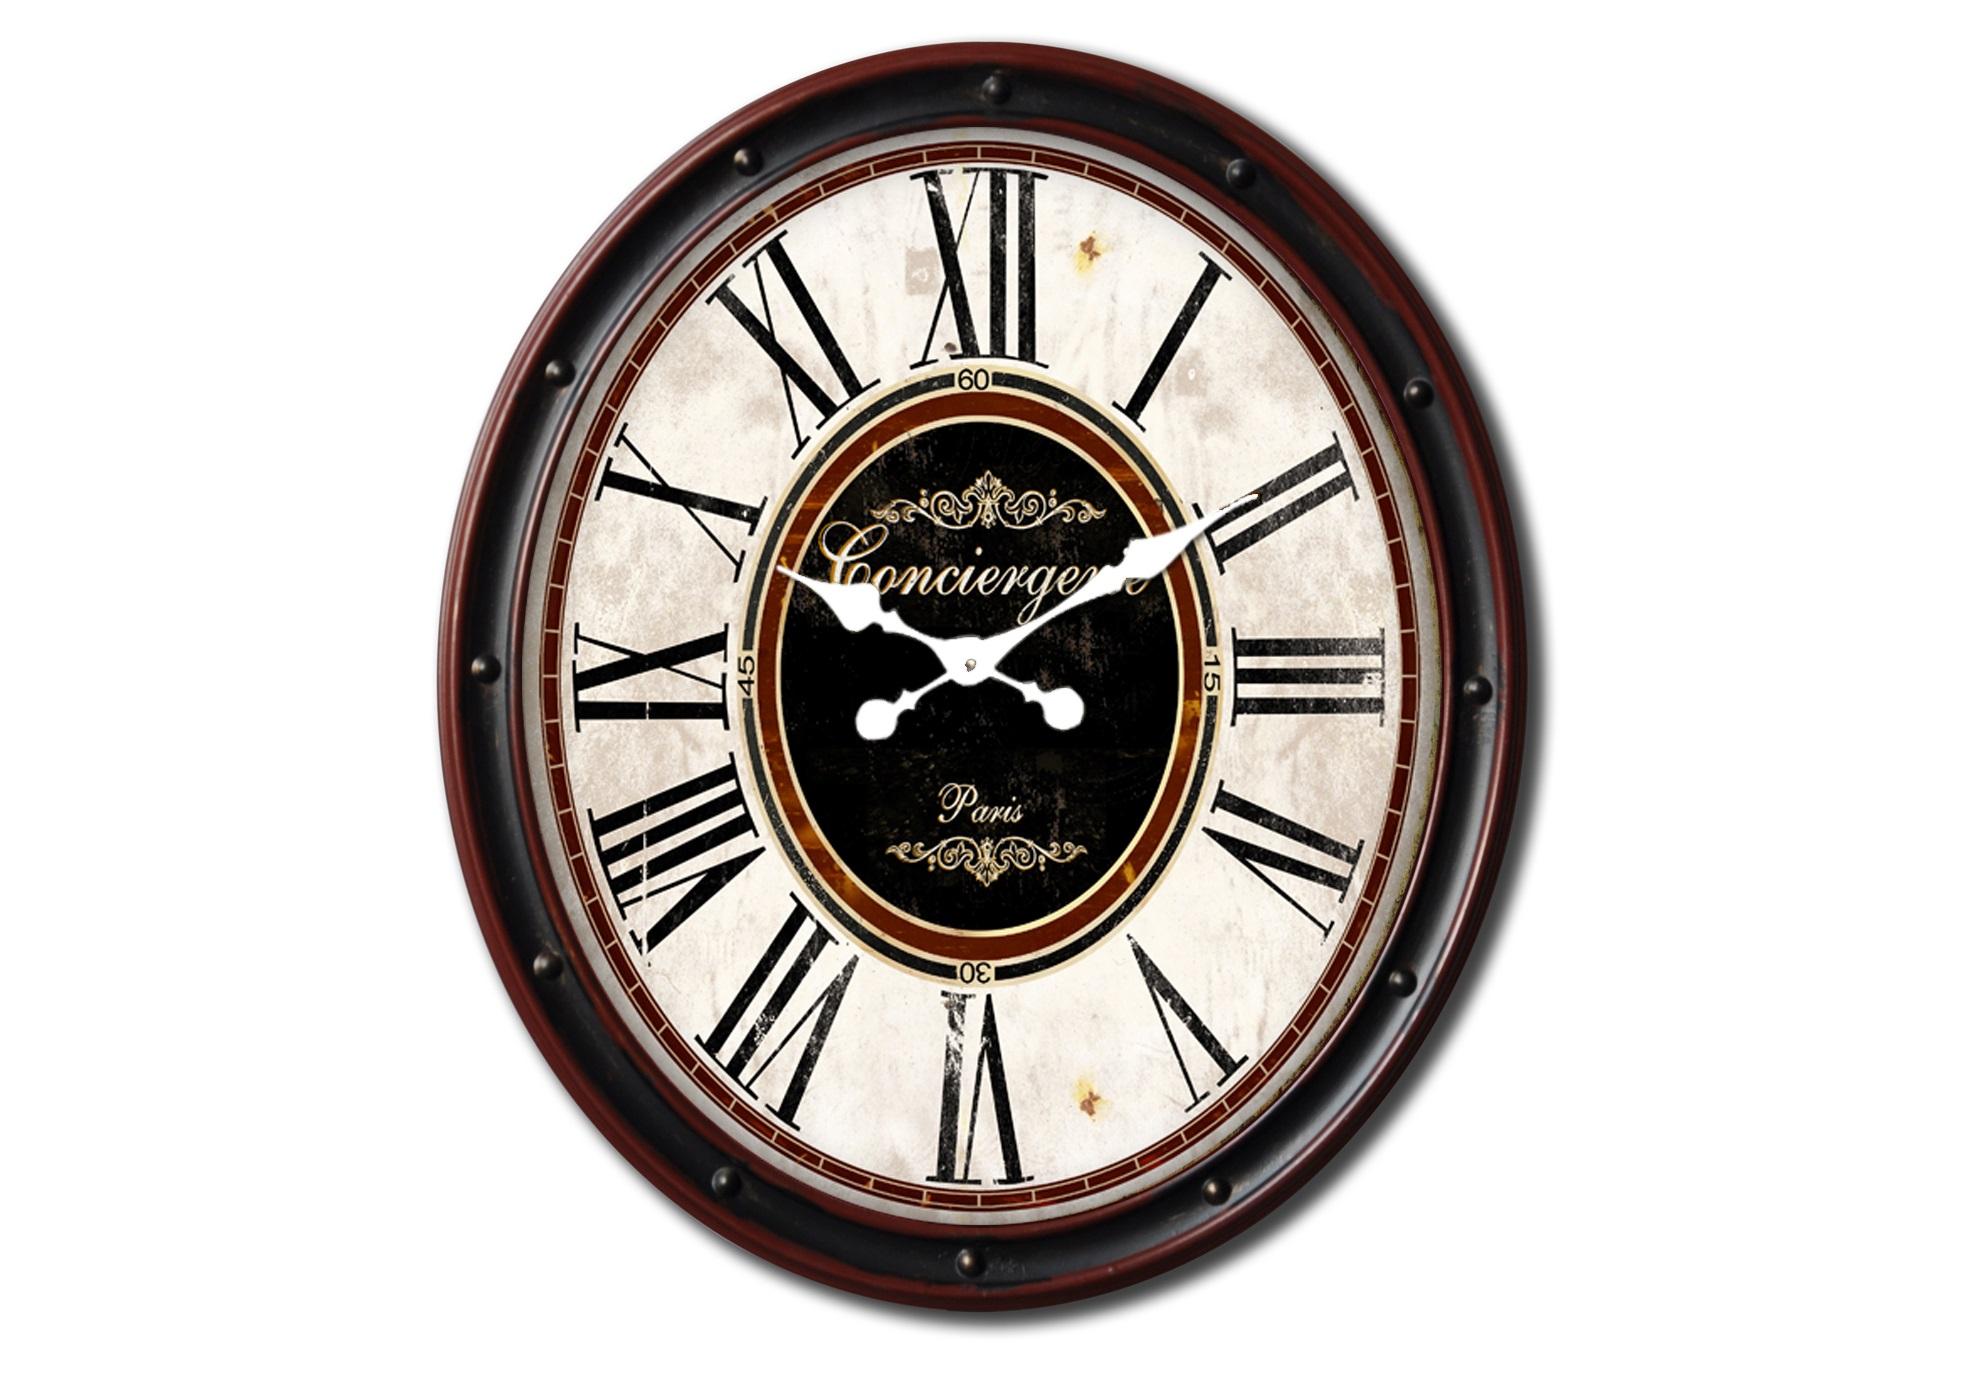 Настенные часы ConciergerieНастенные часы<br>Батарейки типа AА.<br><br>Material: Железо<br>Length см: None<br>Width см: 51<br>Depth см: 5<br>Height см: 60